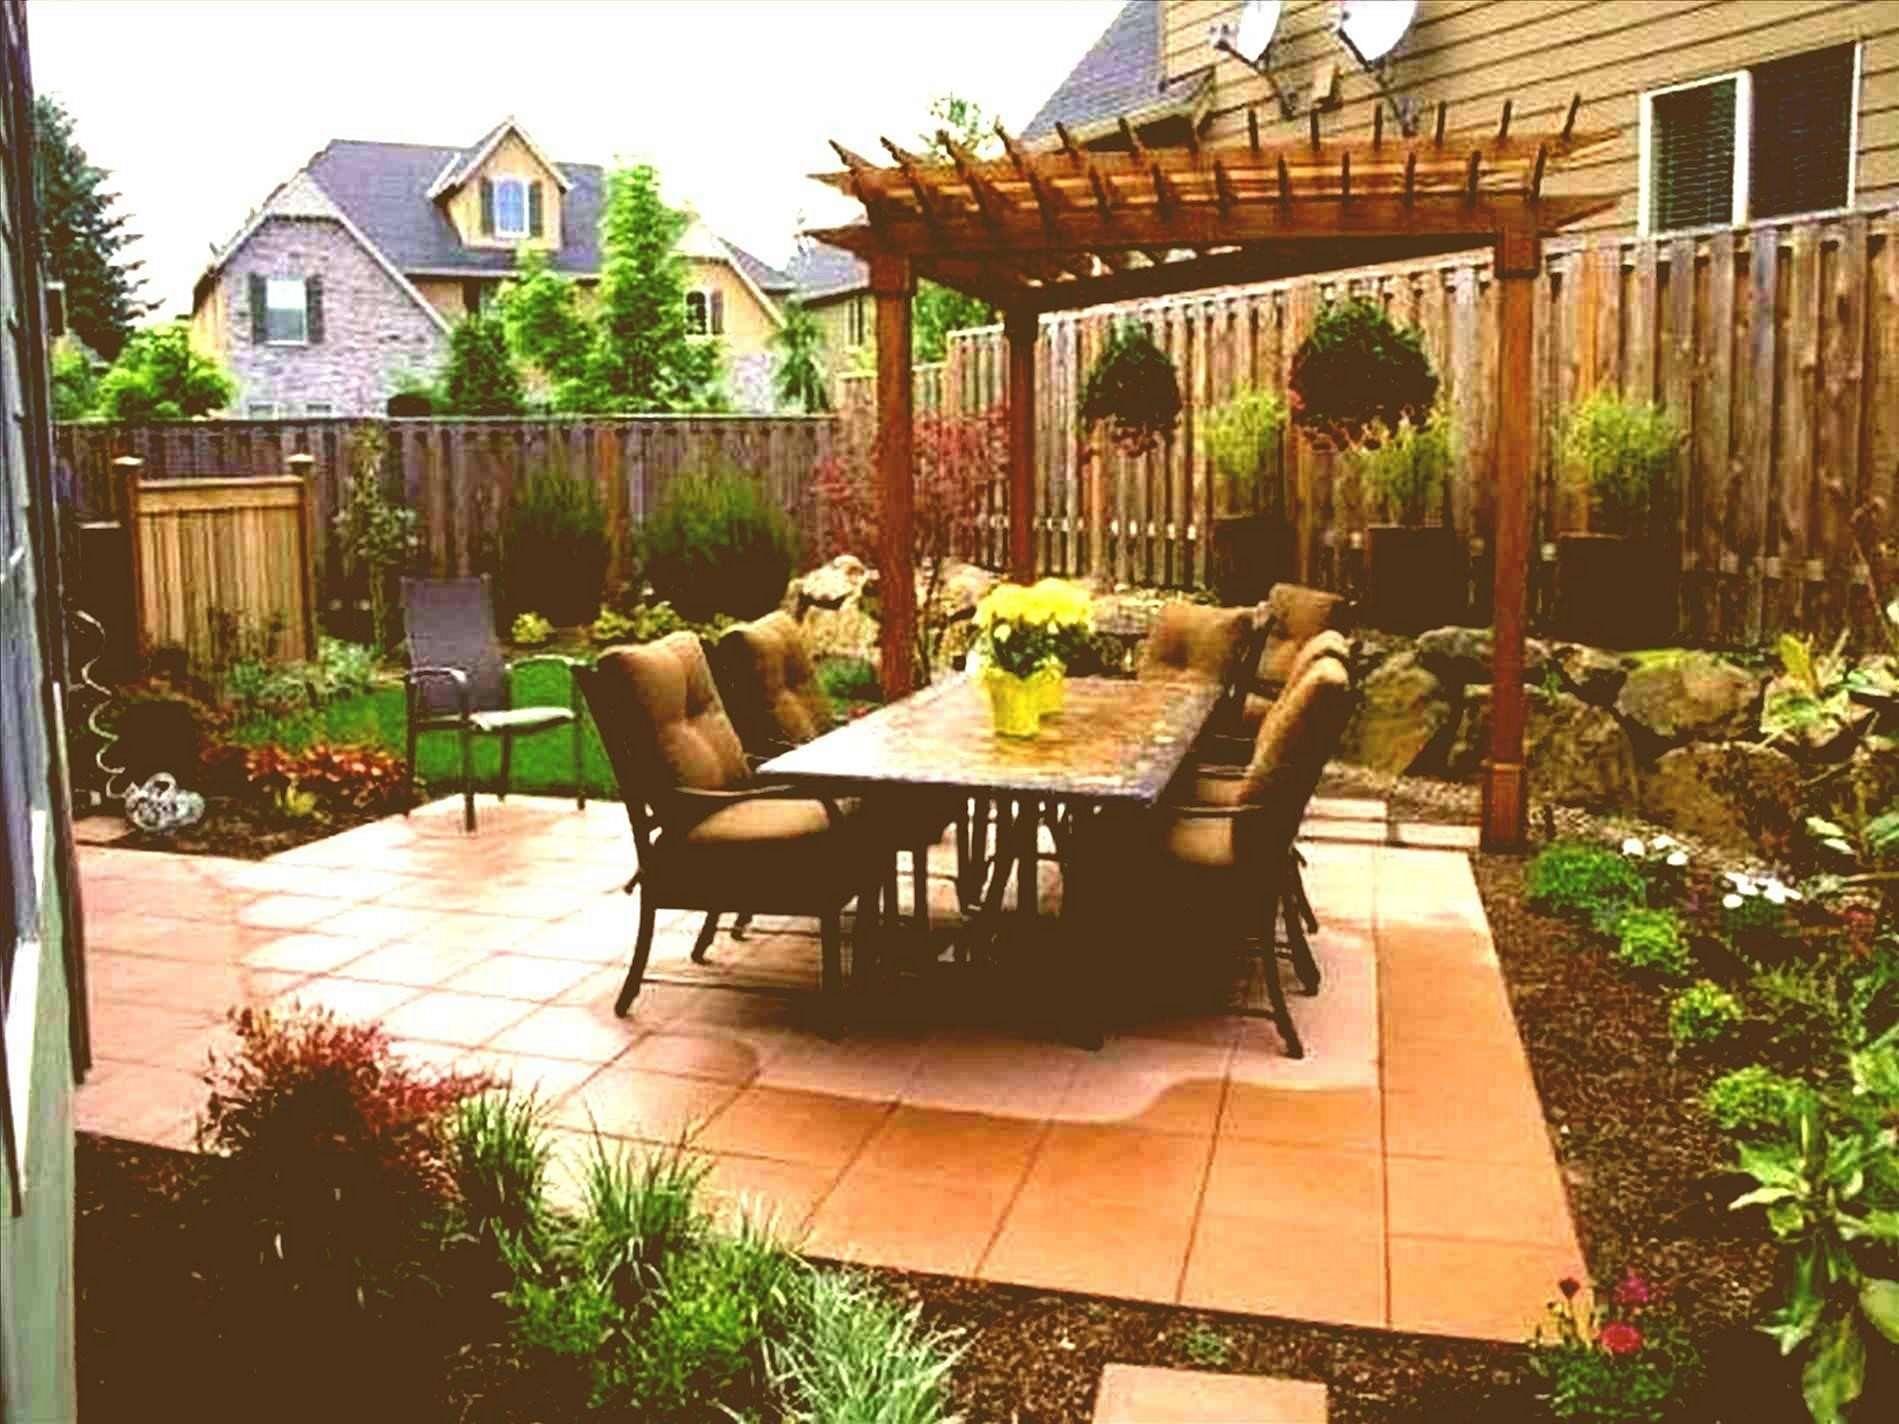 15 Beautiful Backyard Landscaping Ideas To Make Your Happy Small Backyard Landscaping Easy Backyard Landscaping Backyard Landscaping Townhouse backyard ideas no grass